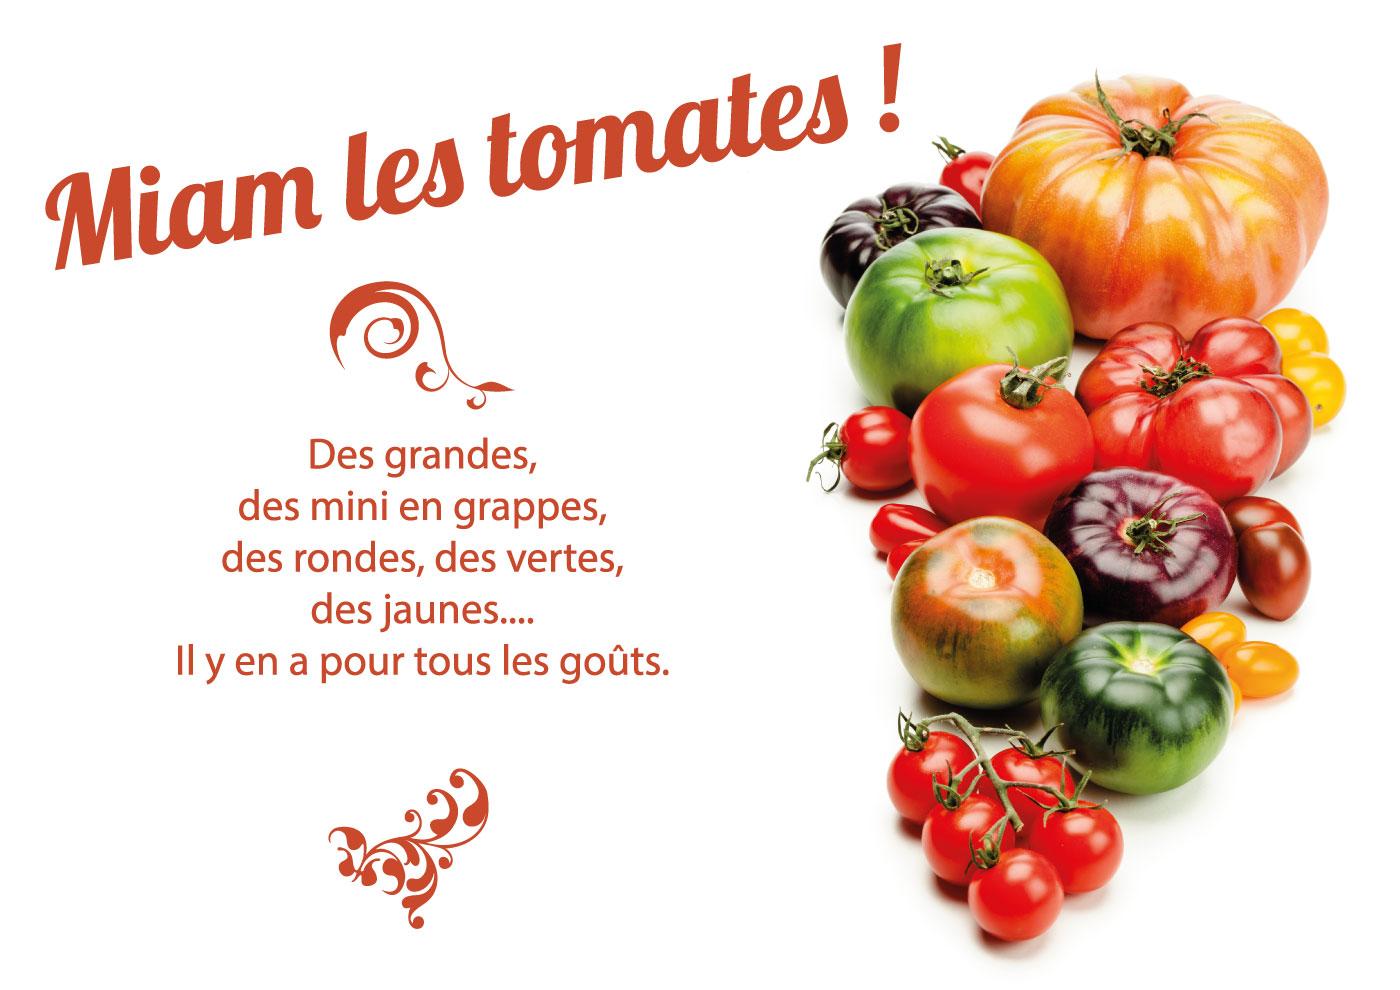 miam les tomates coeur de boeuf